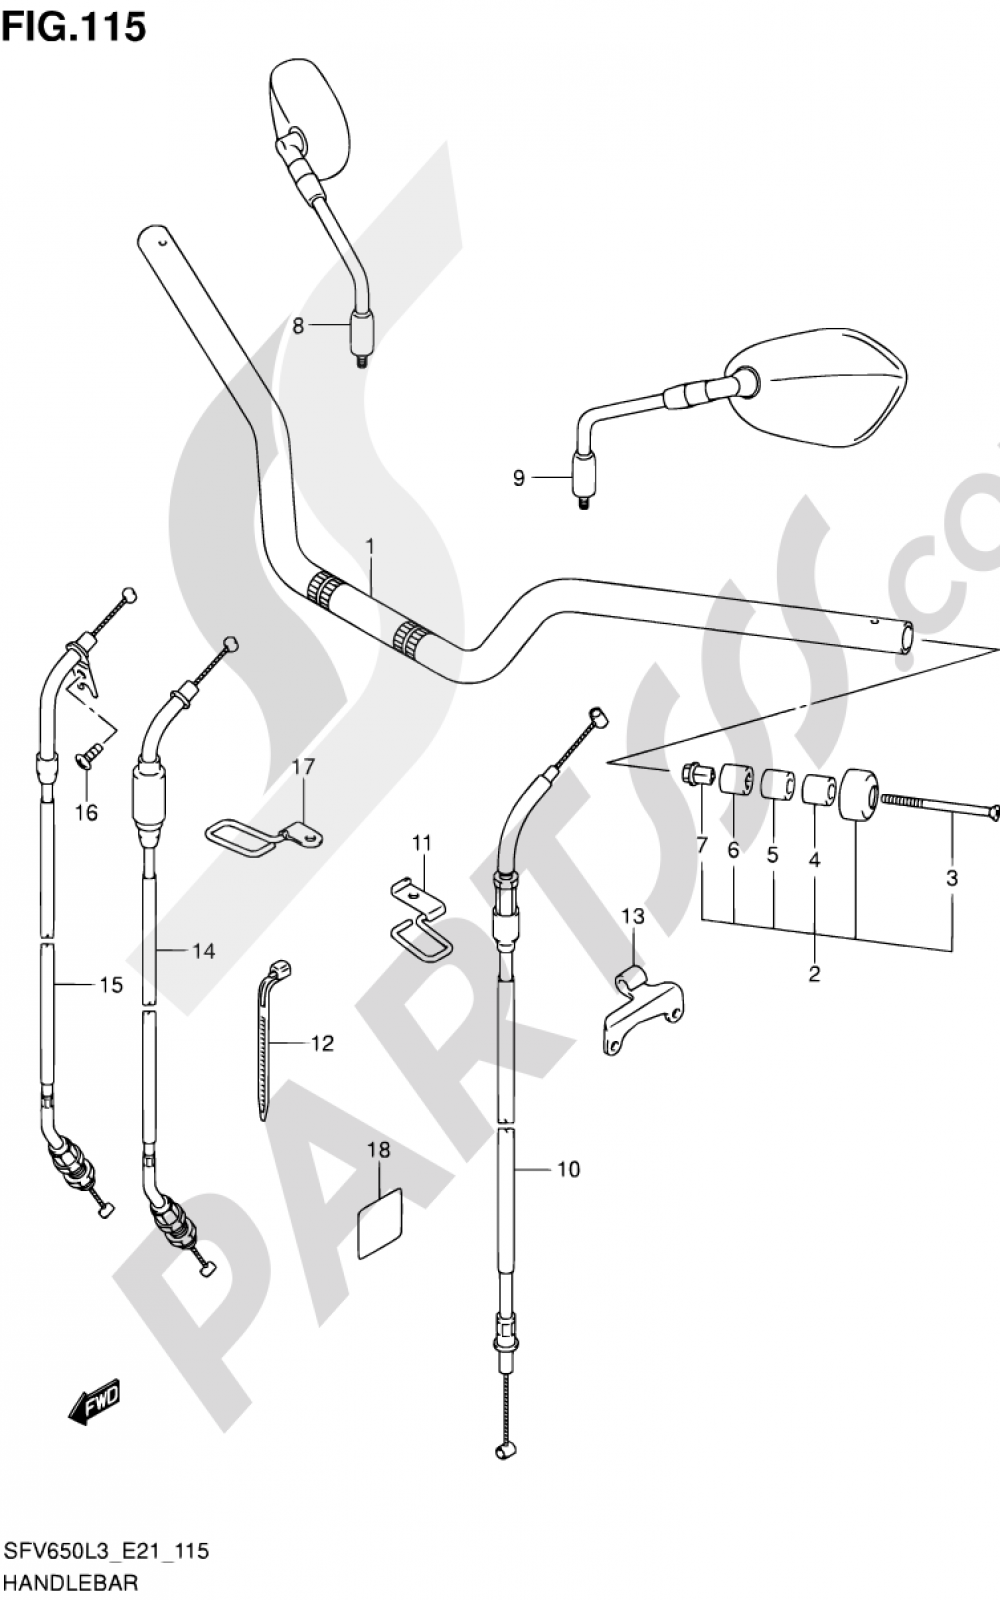 115 - HANDLEBAR (SFV650L3 E24) Suzuki GLADIUS SFV650A 2013